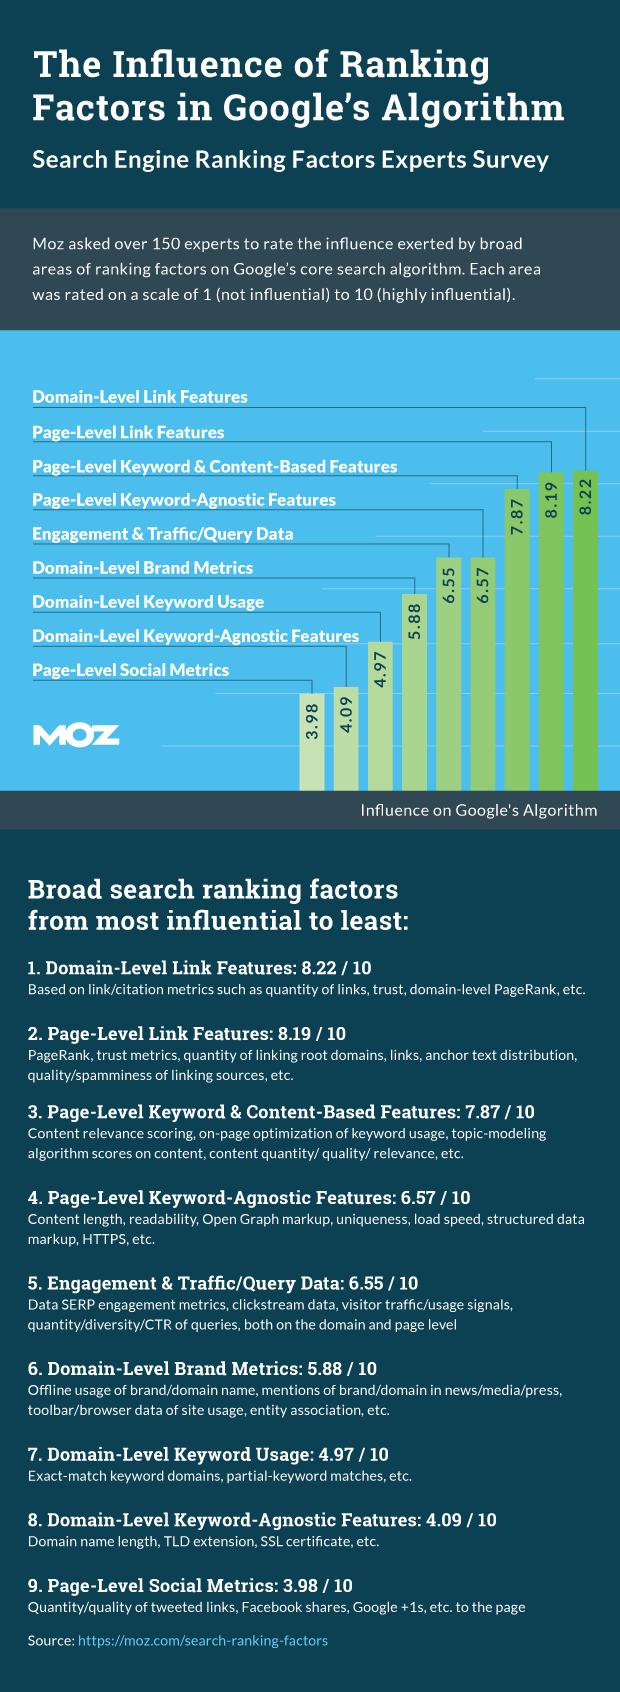 Moz SEO ranking factors 2015